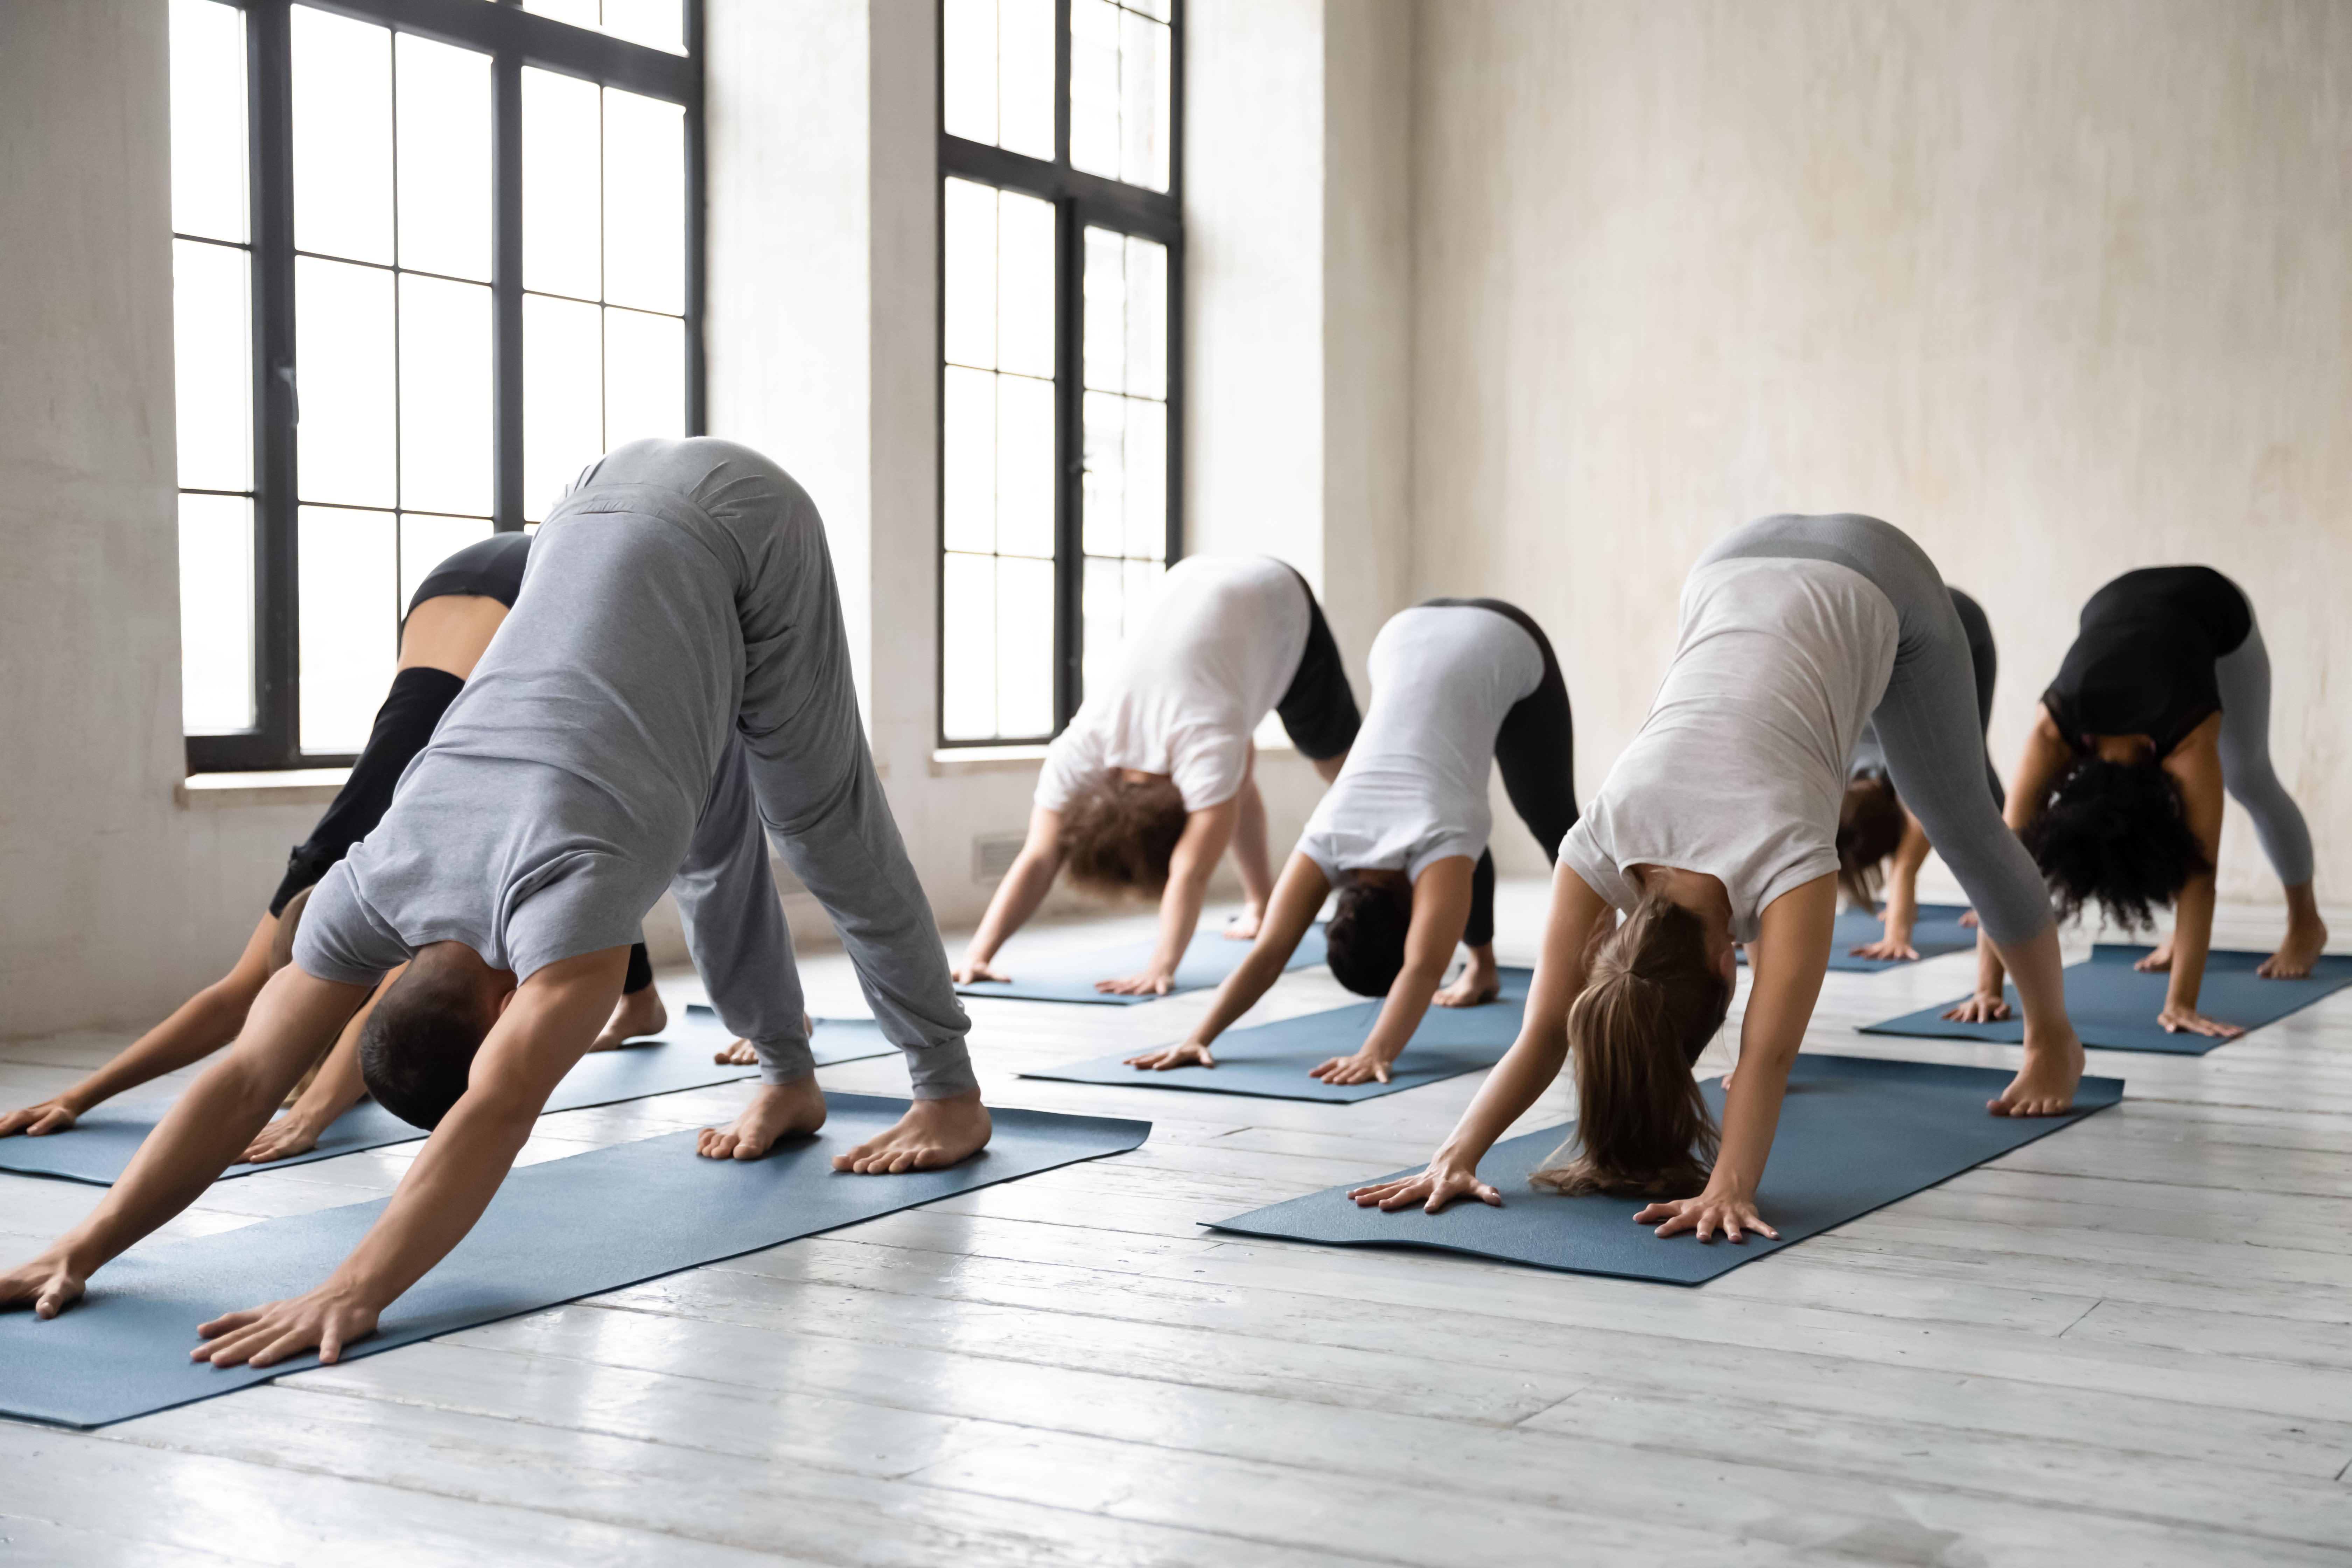 Yoga Teachers Take On QAnon